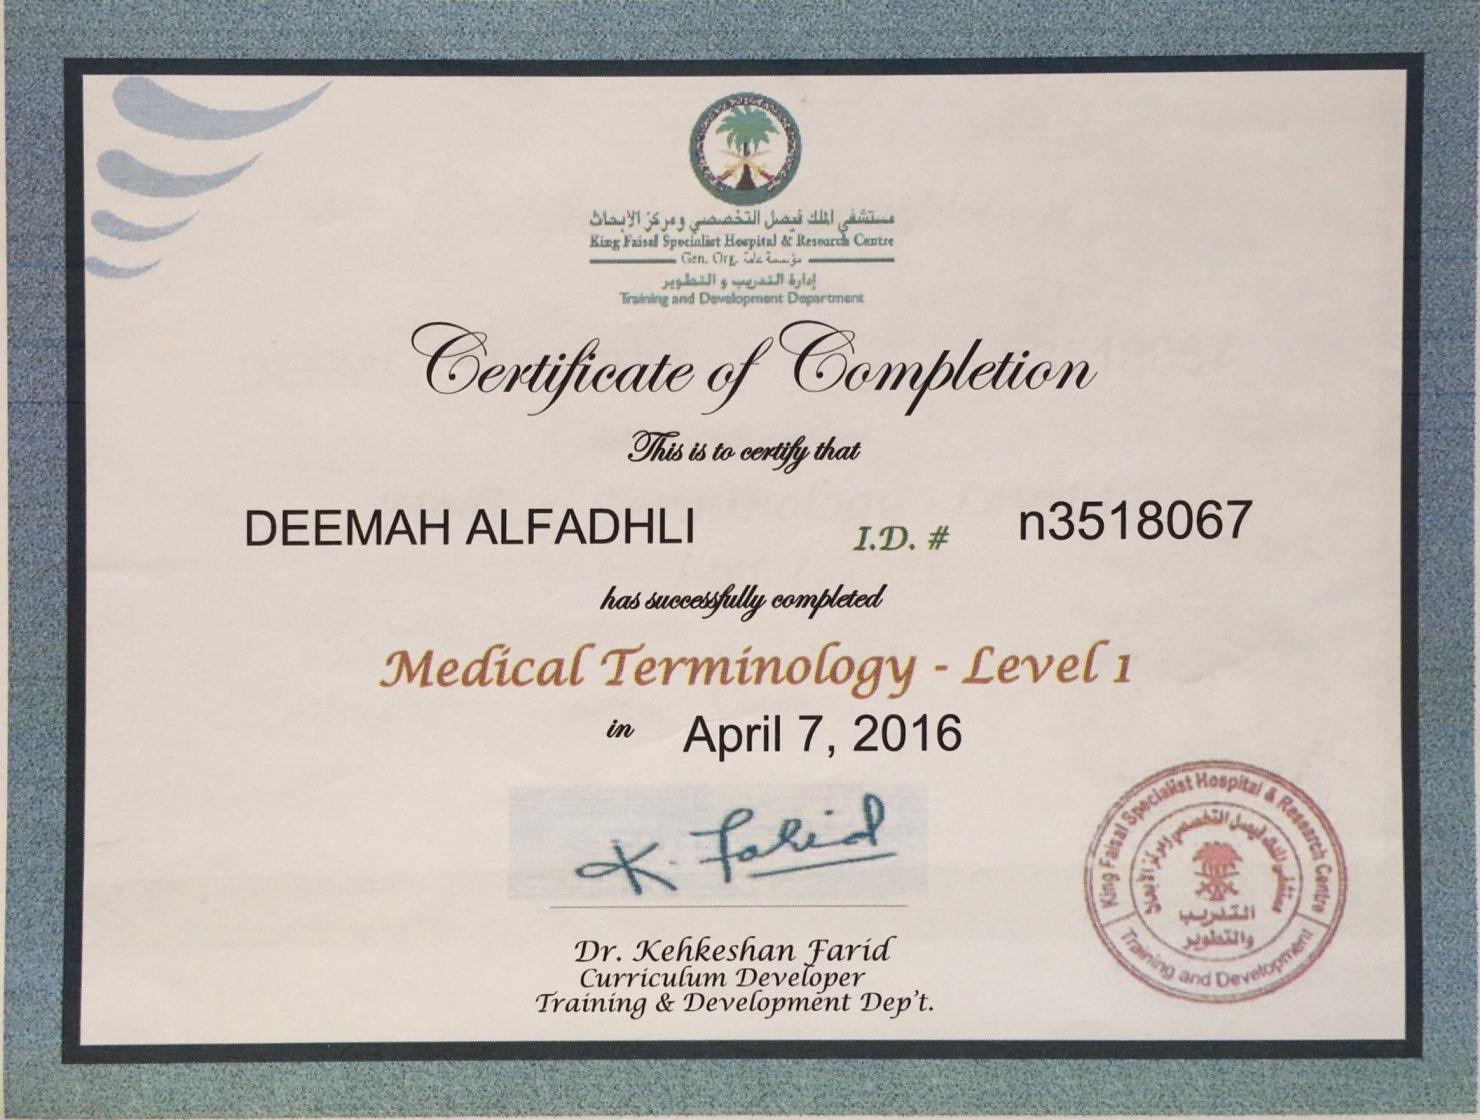 Deemah saad m alfadhli bayt medical terminology certificate 1betcityfo Choice Image